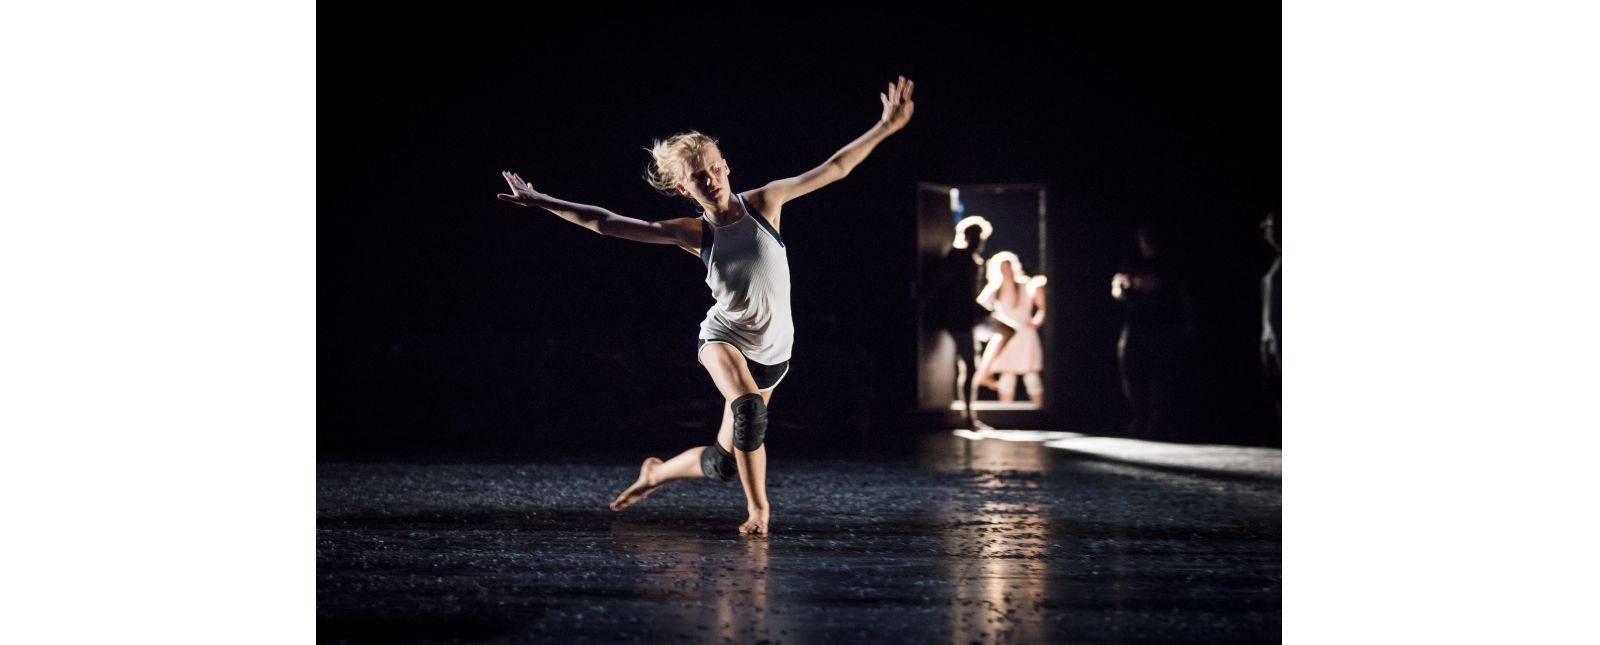 Le Sacre du Printemps // School of Life and Dance (SoLD) // Foto: Marc Doradzillo // 2018